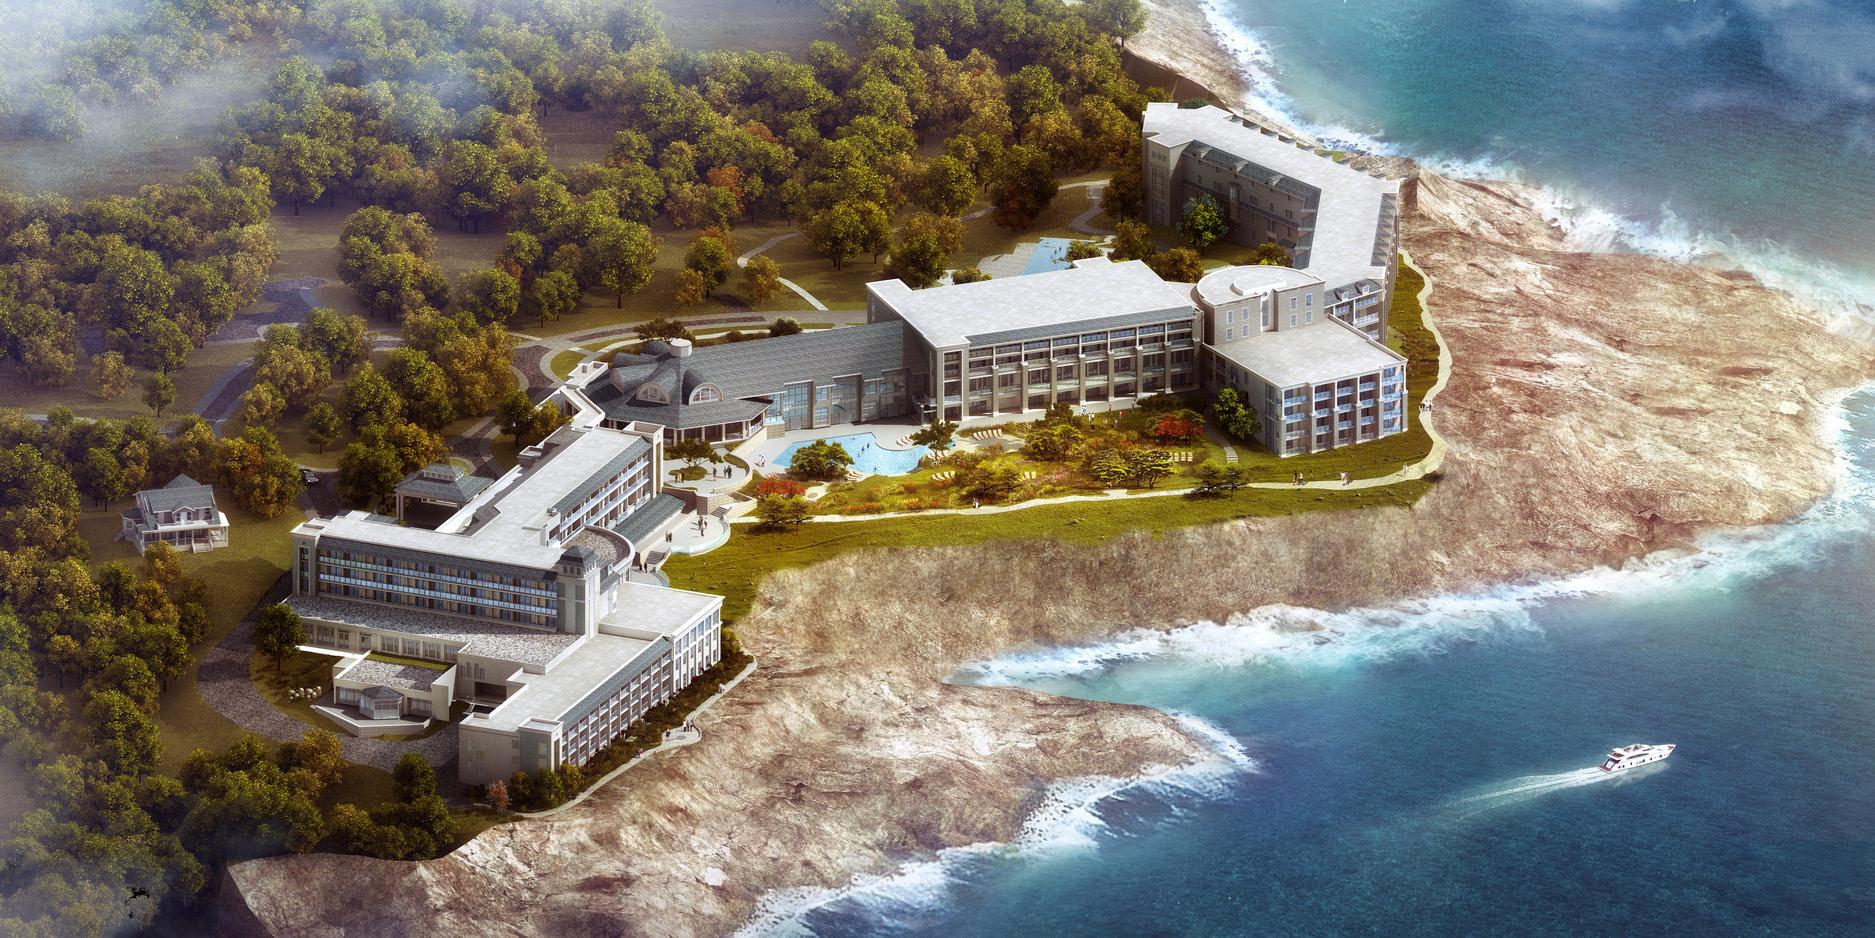 rsz_cliff_house_aerial